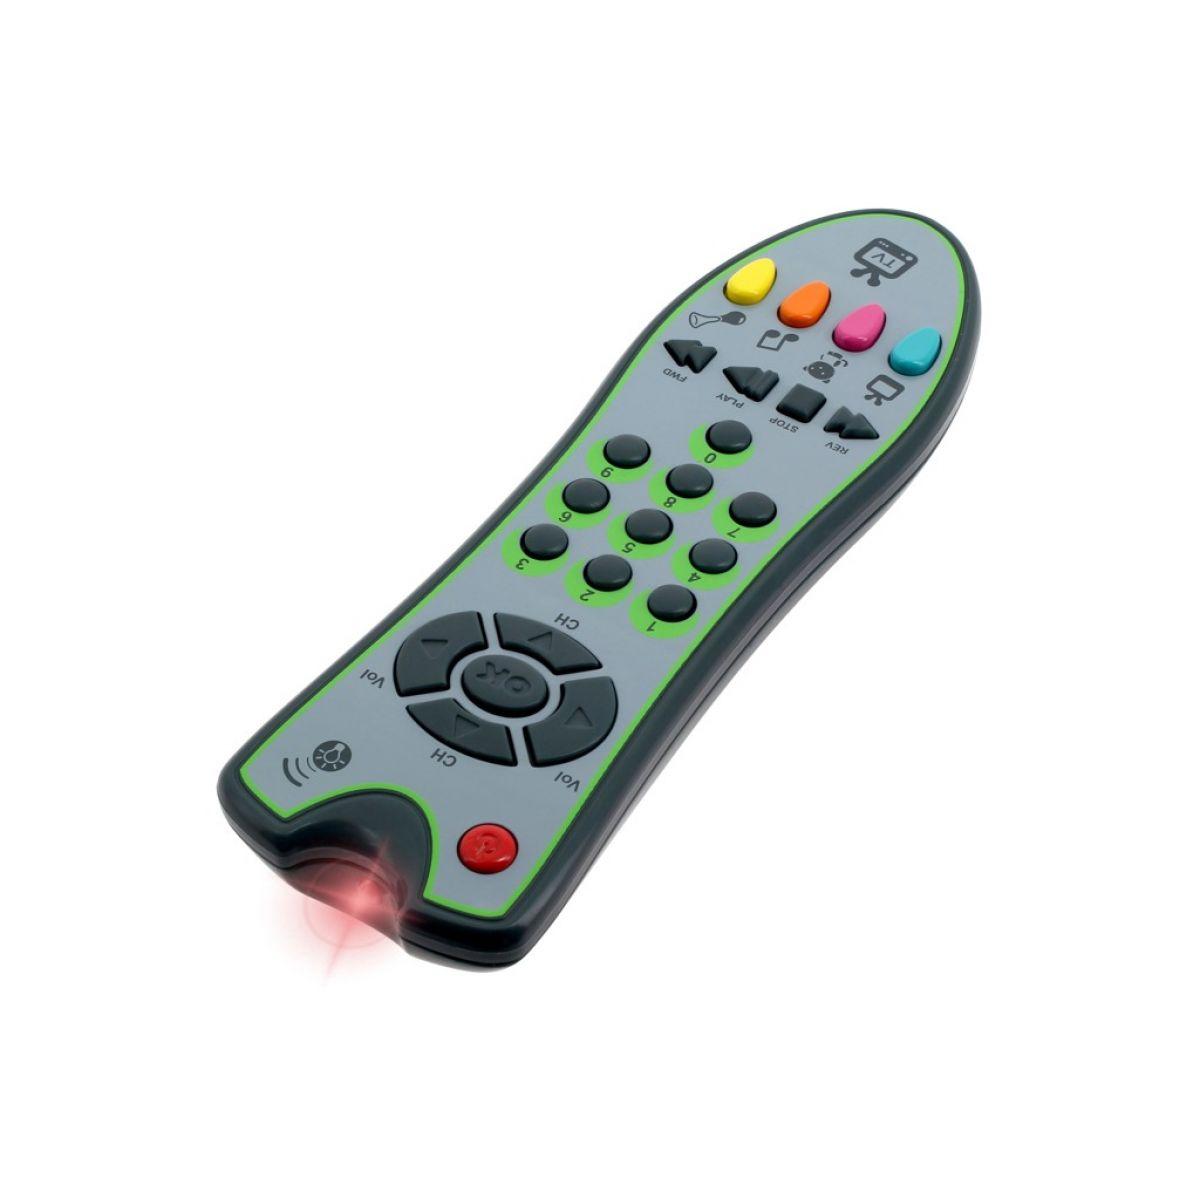 AllToys Ovladač Zip Zap TV S0884